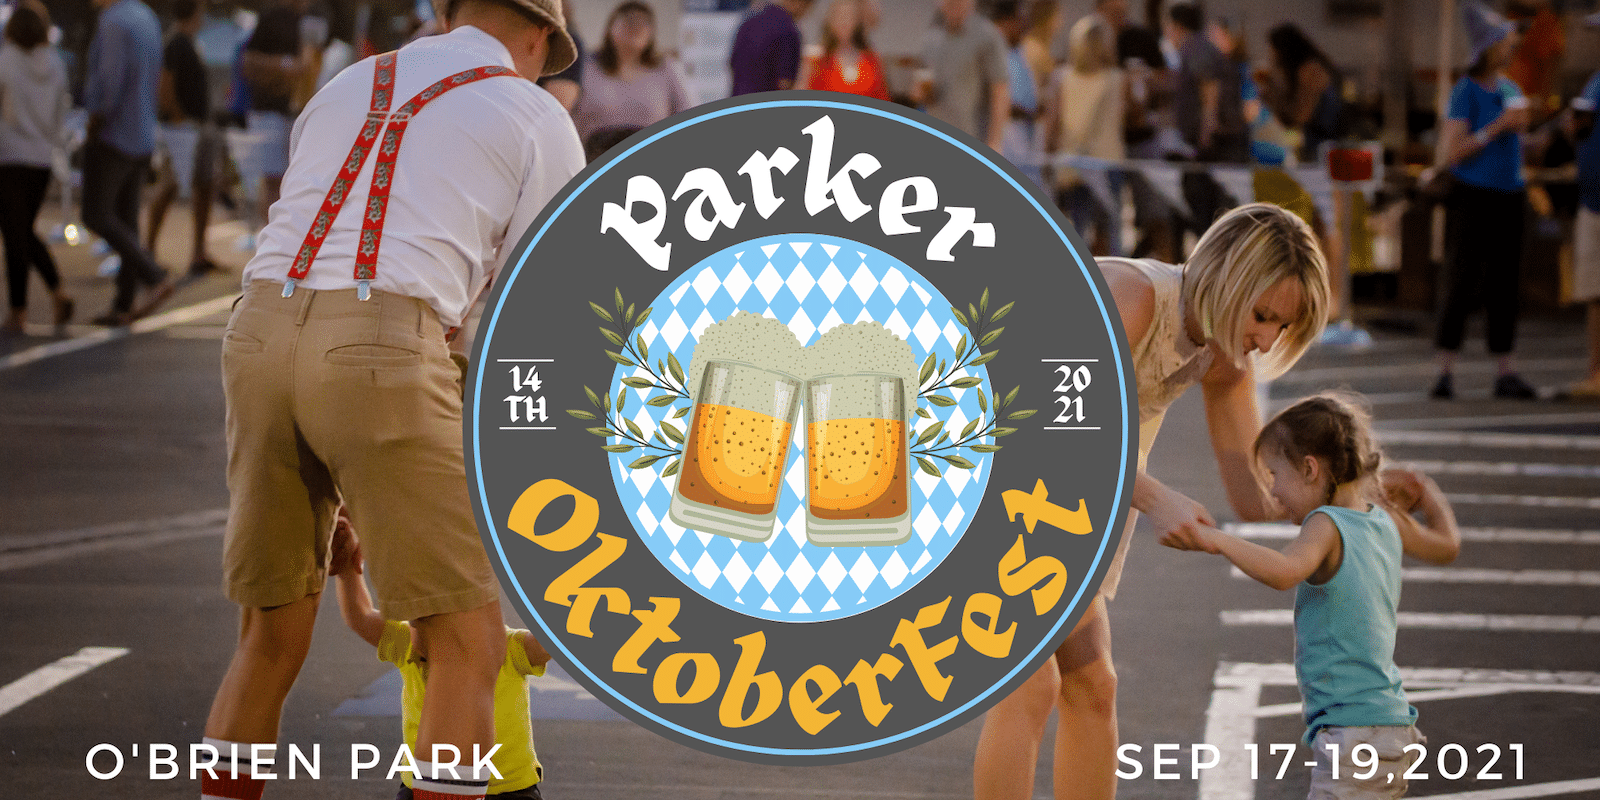 Image of the Parker Oktoberfest event information